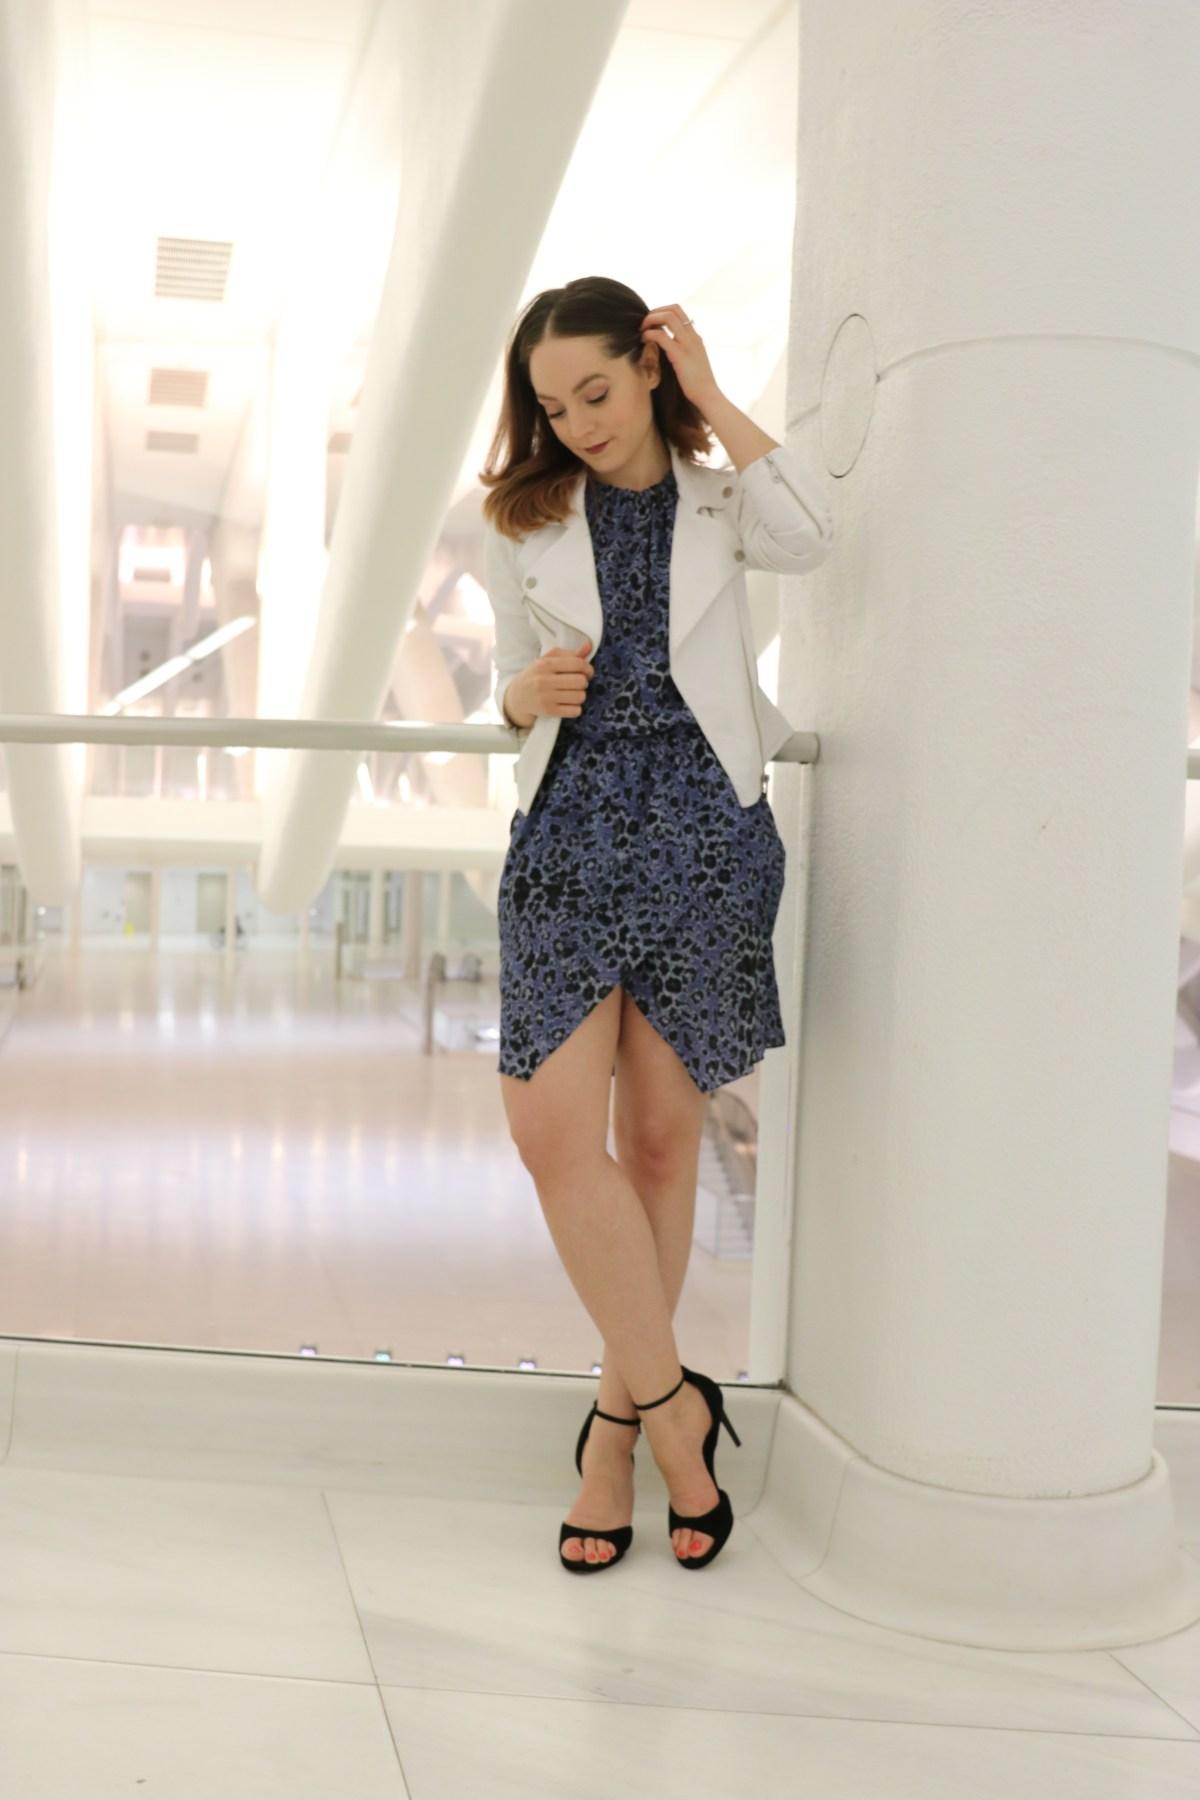 How To Find Affordable Designer Clothing Online